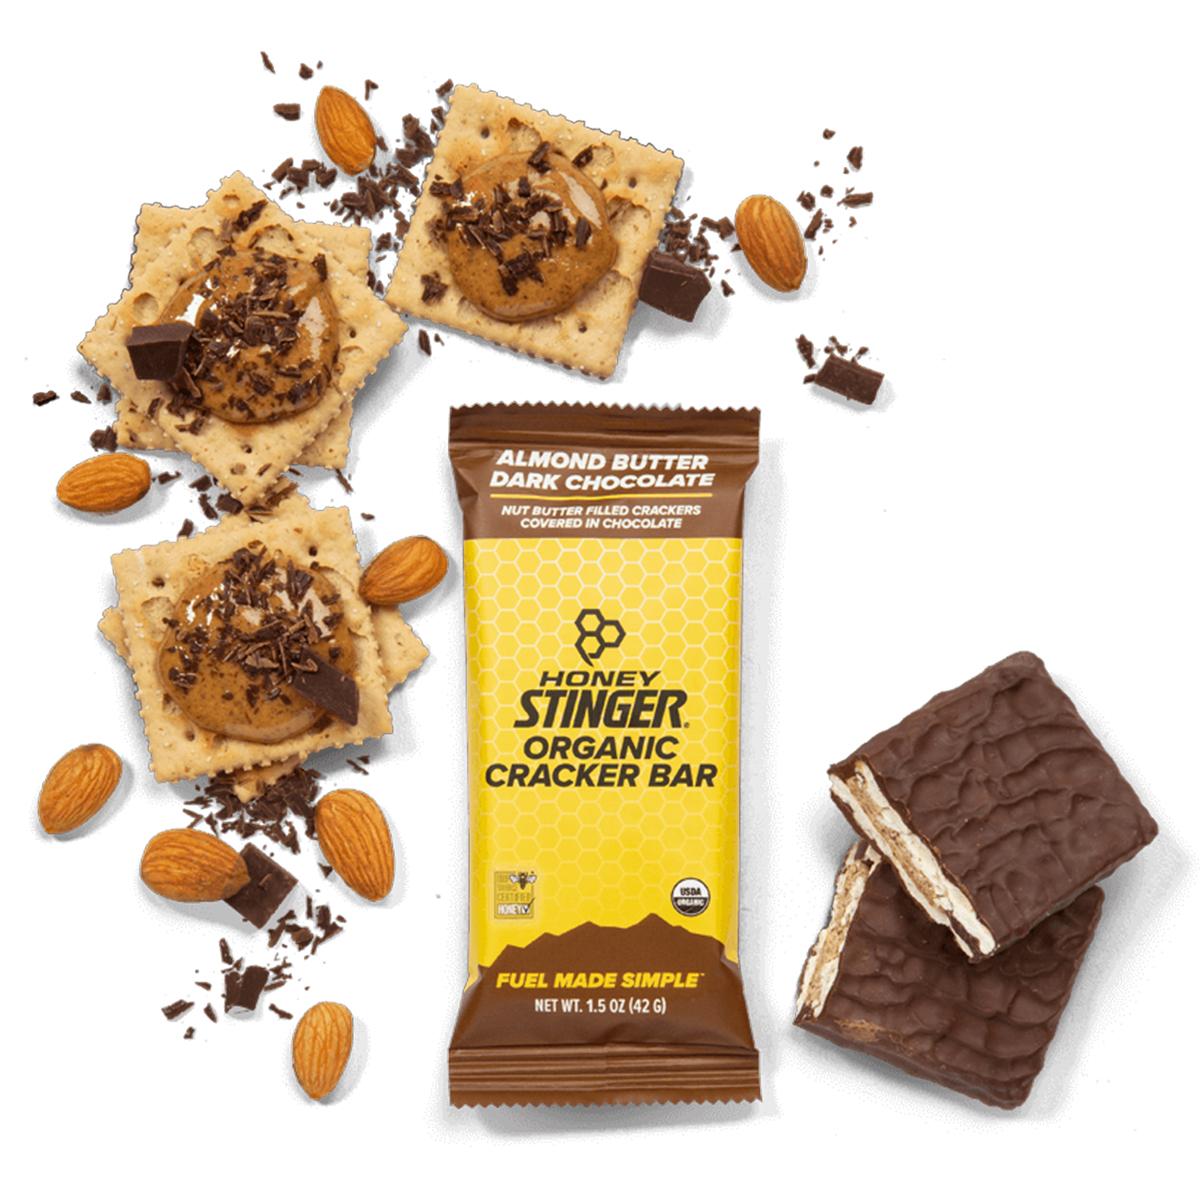 Honey Stinger Organic Cracker Bar - Flavor: Almond Butter Dark Chocolate - Size: Box of 12, Almond Butter Dark Chocolate, large, image 2